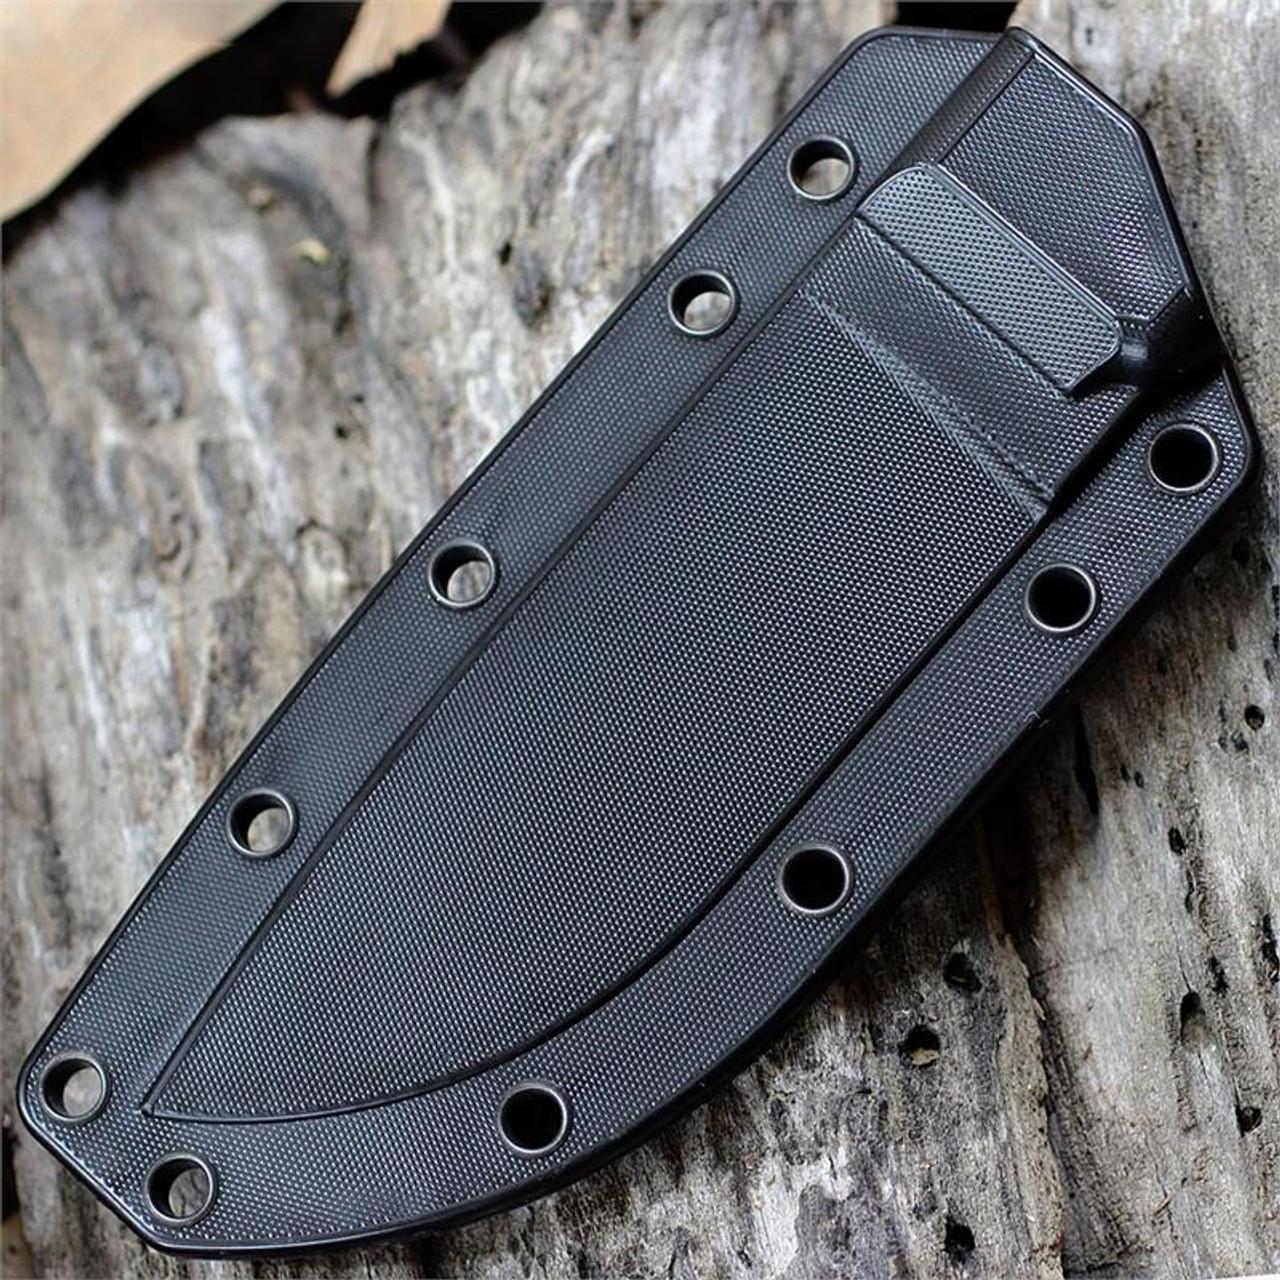 ESEE Knives, 4P-MB-B, Black Blade, Plain Edge, Micarta Handle, Black Molded Sheath and Clip Plate w/ Molle Back